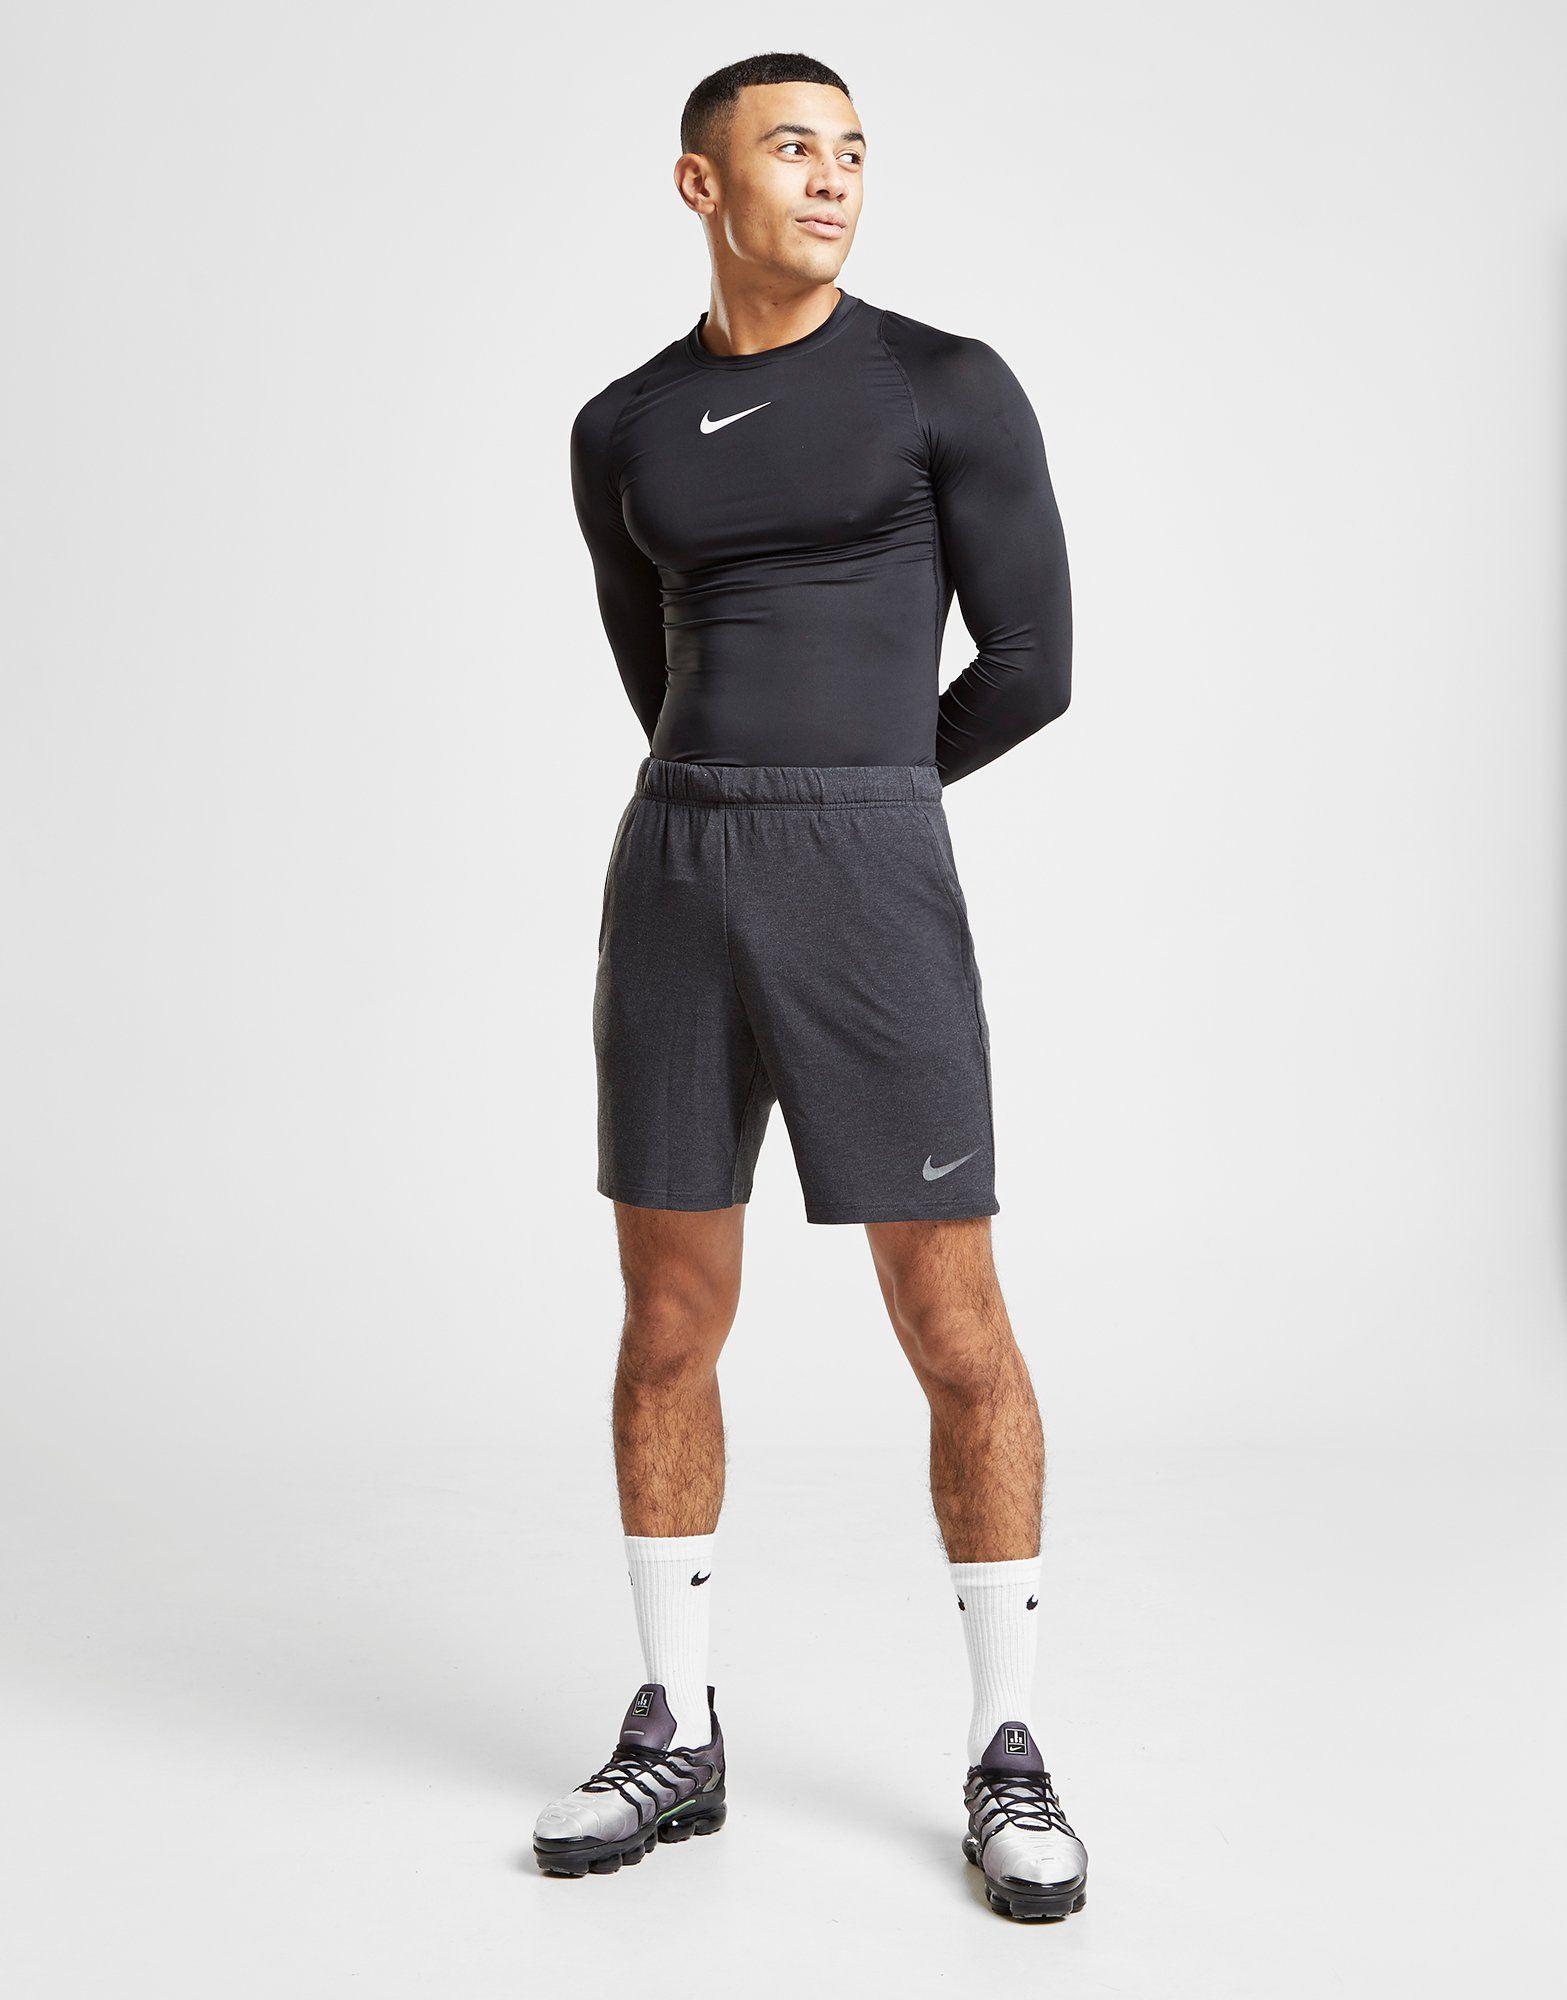 Nike Lightweight Shorts